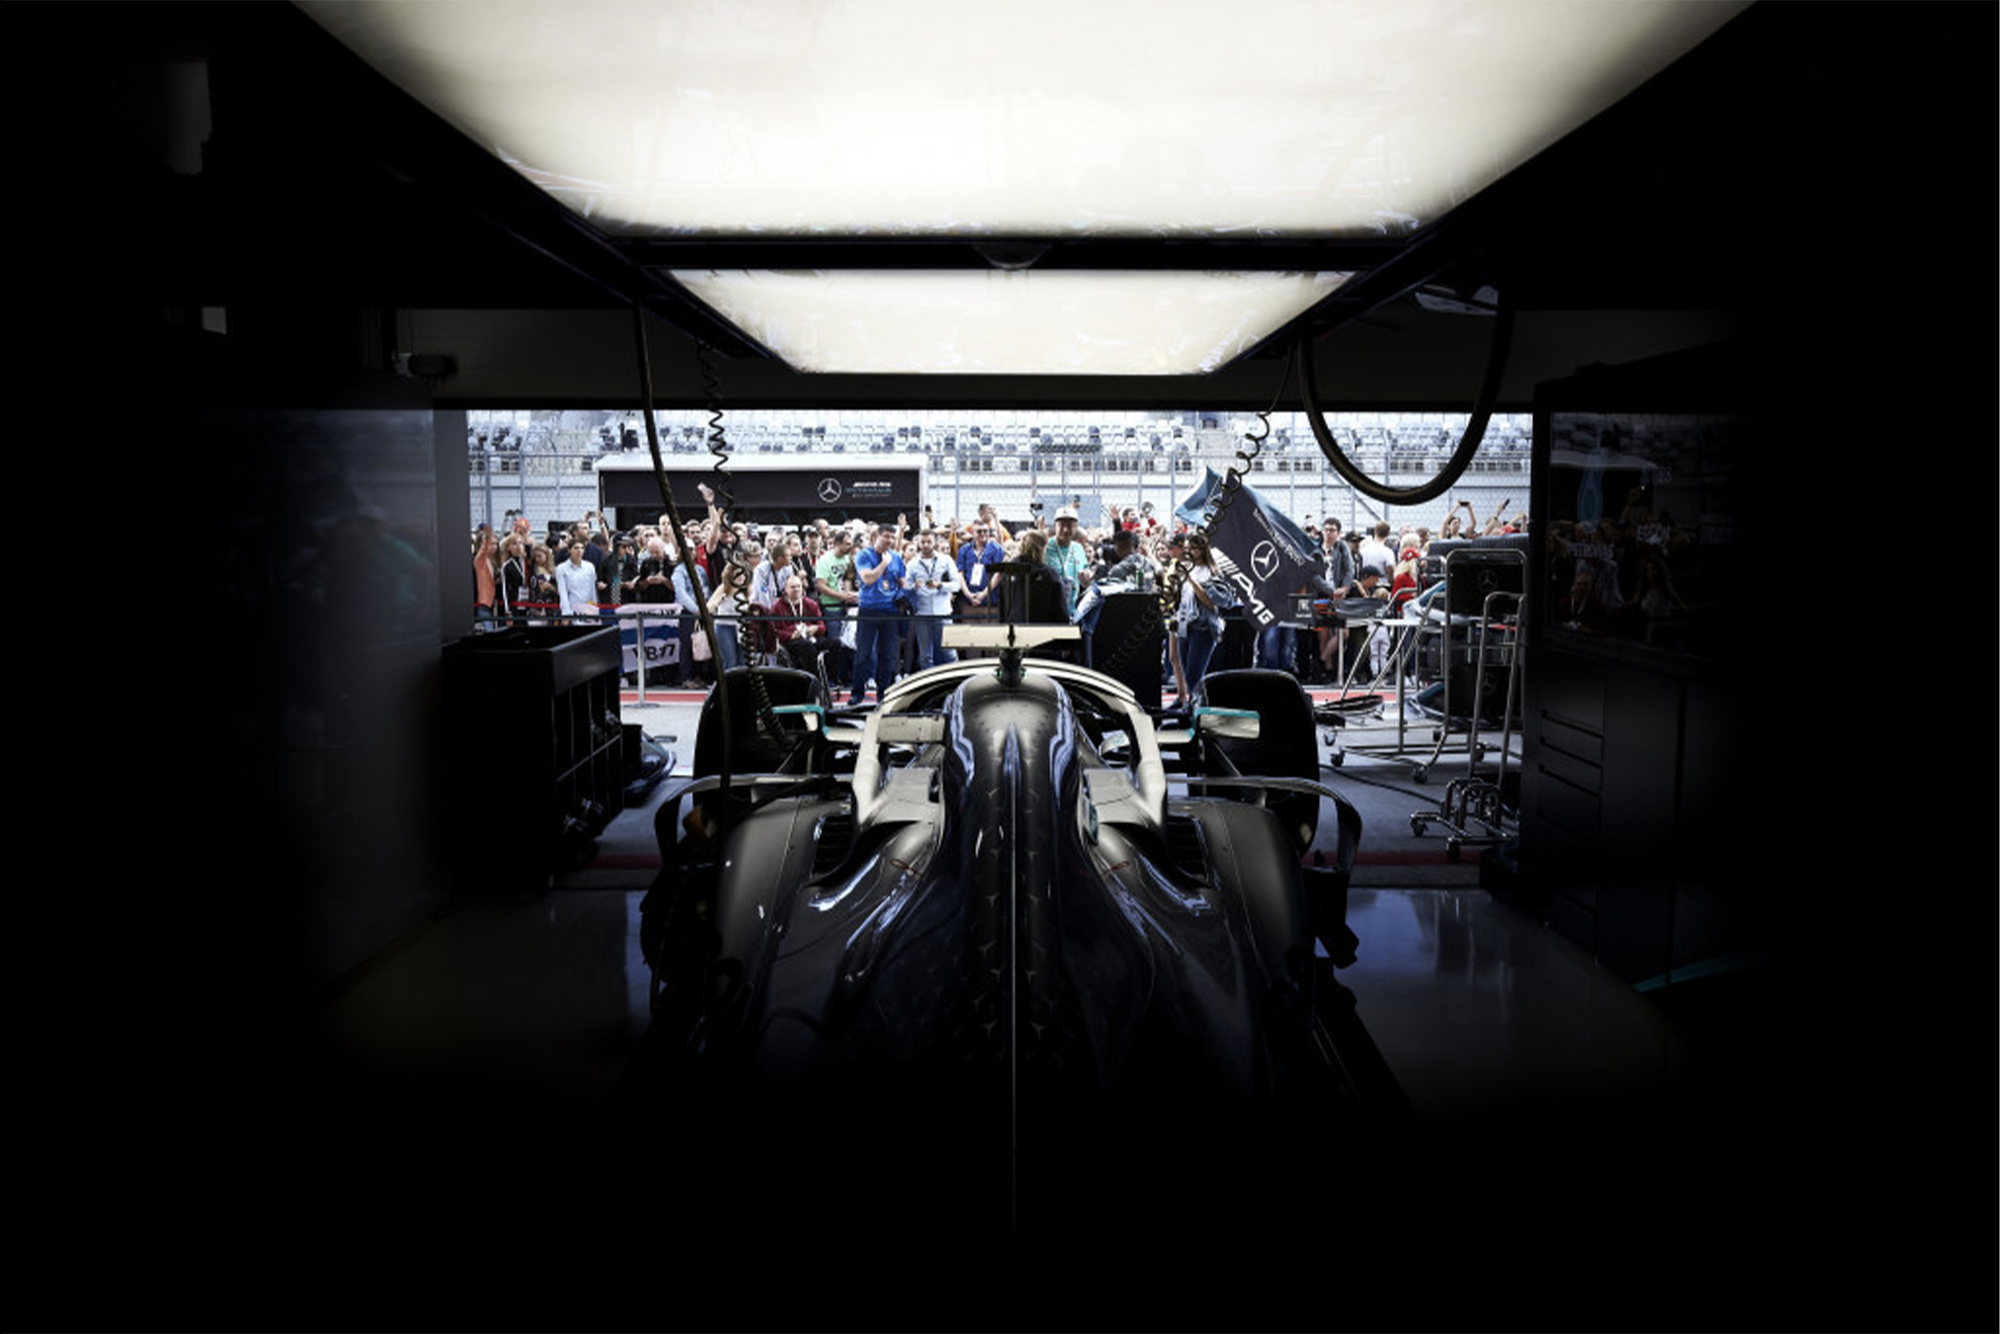 Mercedes garage during the 2019 season